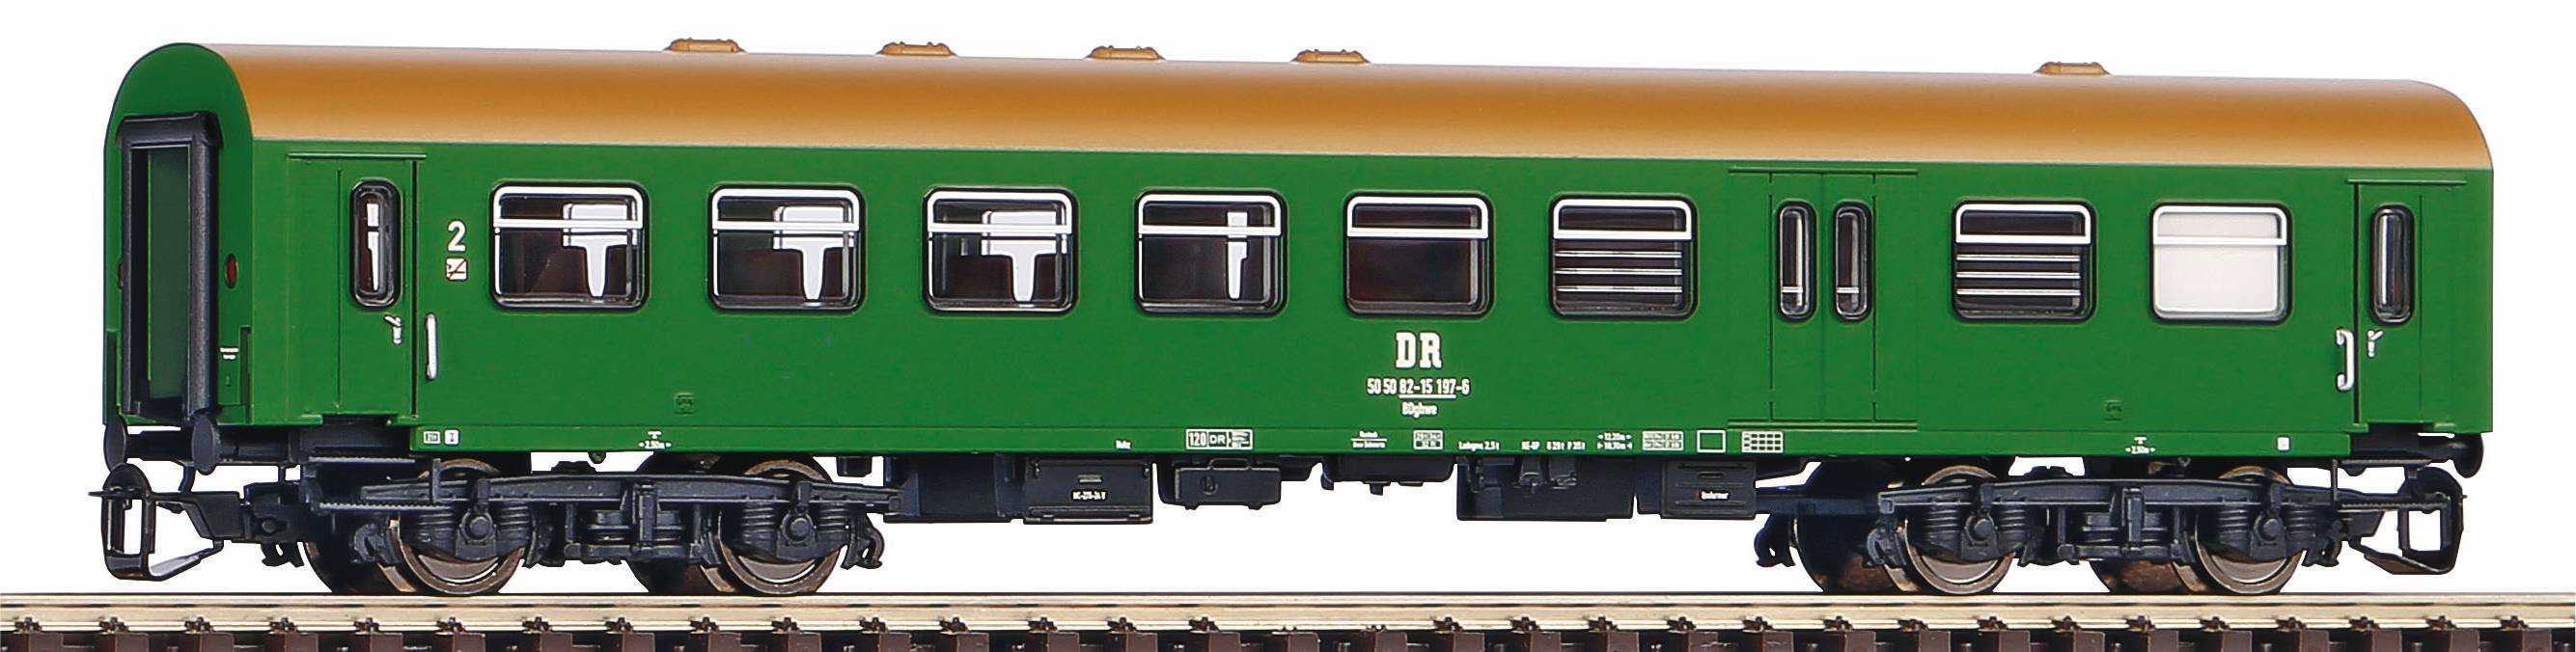 Piko Osobní vagón Reko 2. Tř. DR IV - 47609